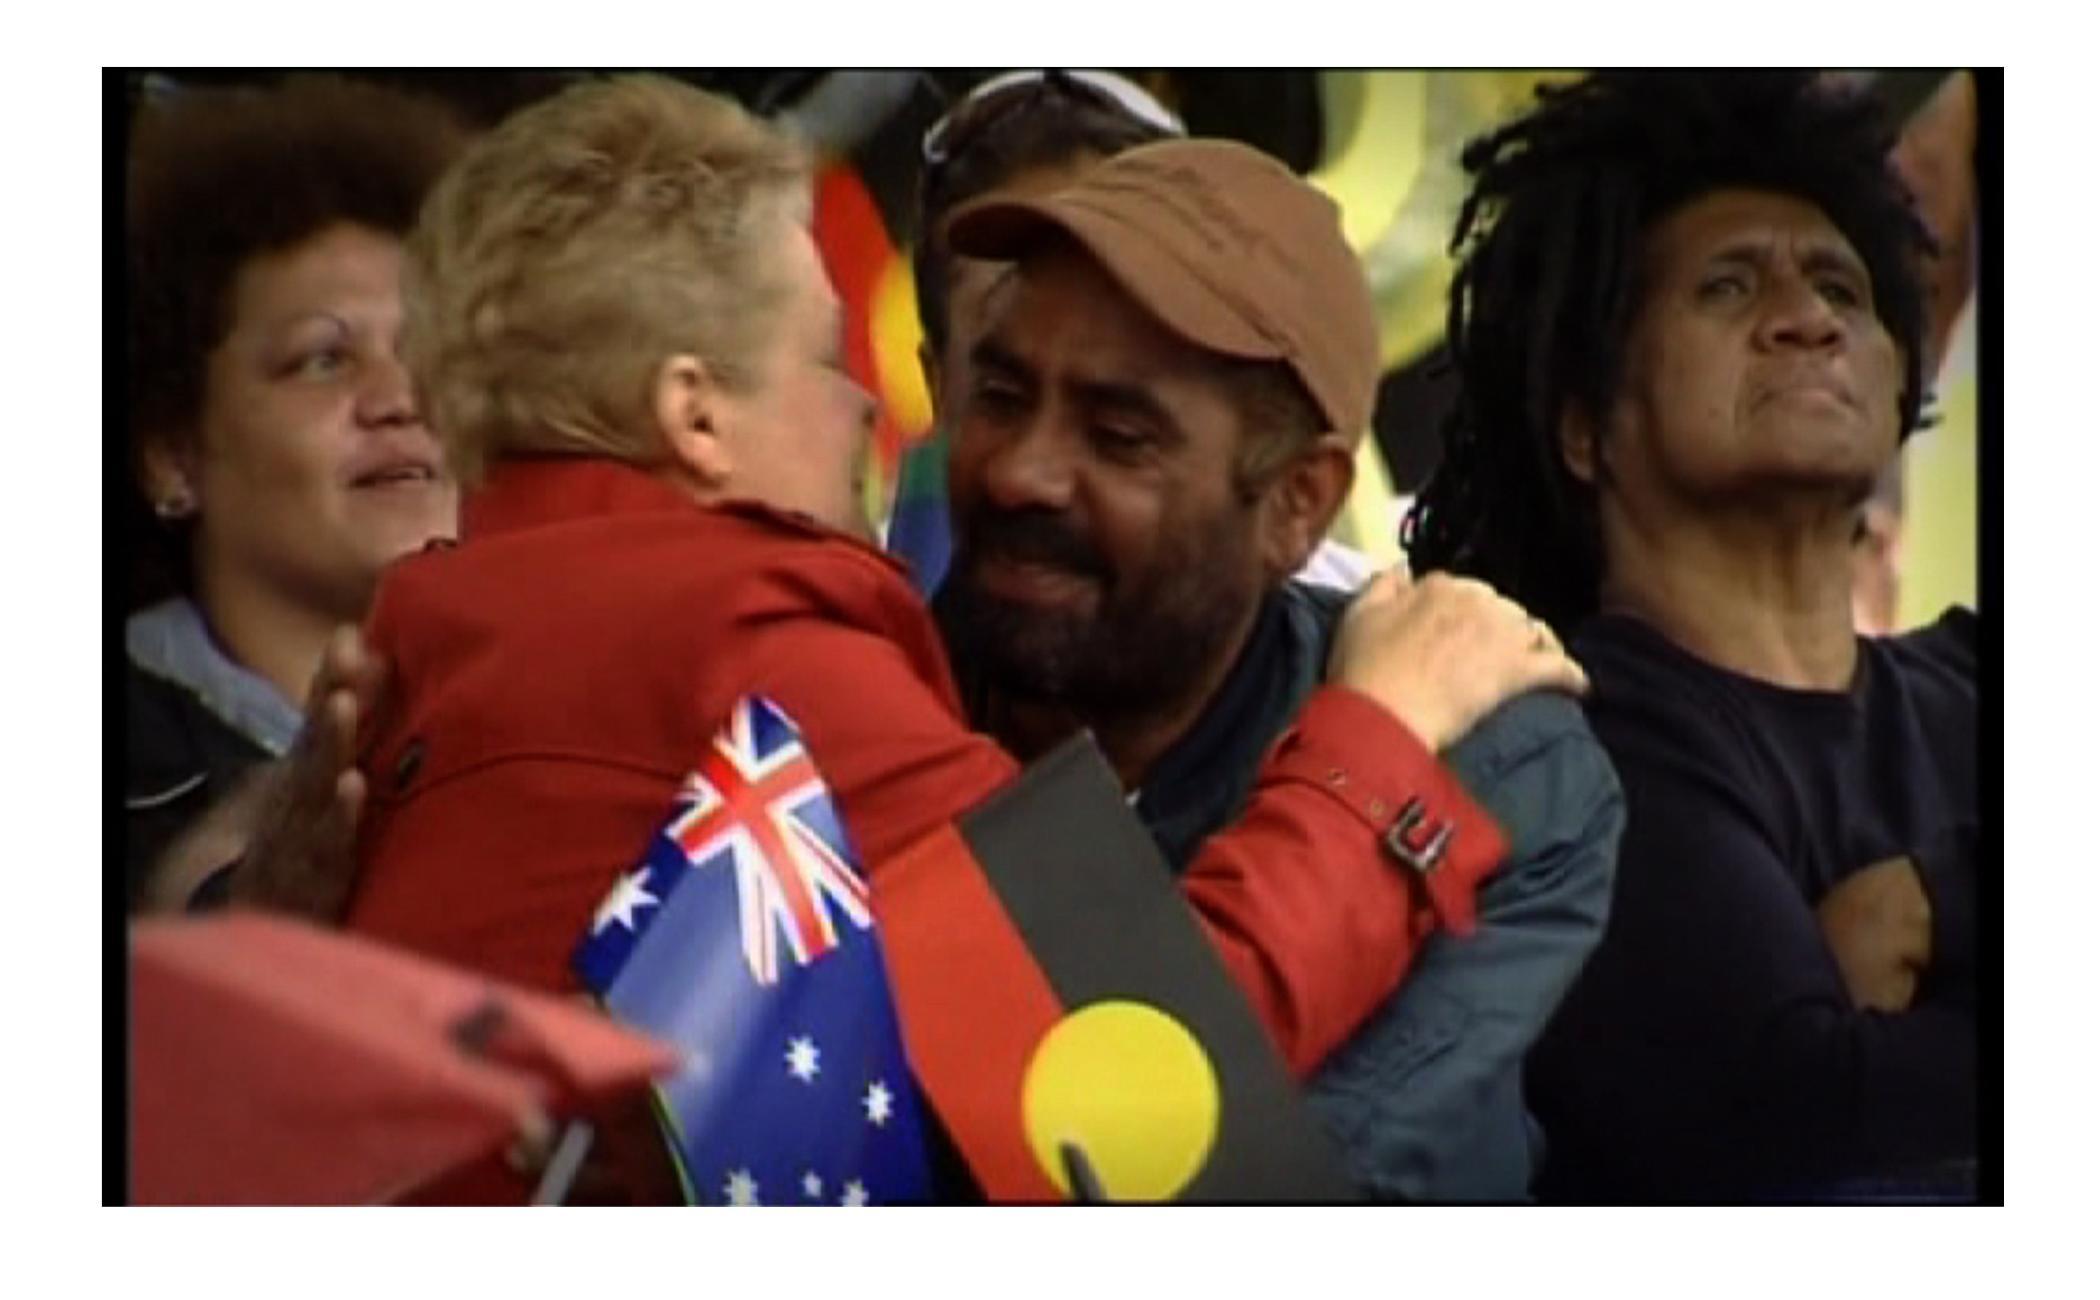 Indigenous Australians: Aboriginal and Torres Strait Islander people